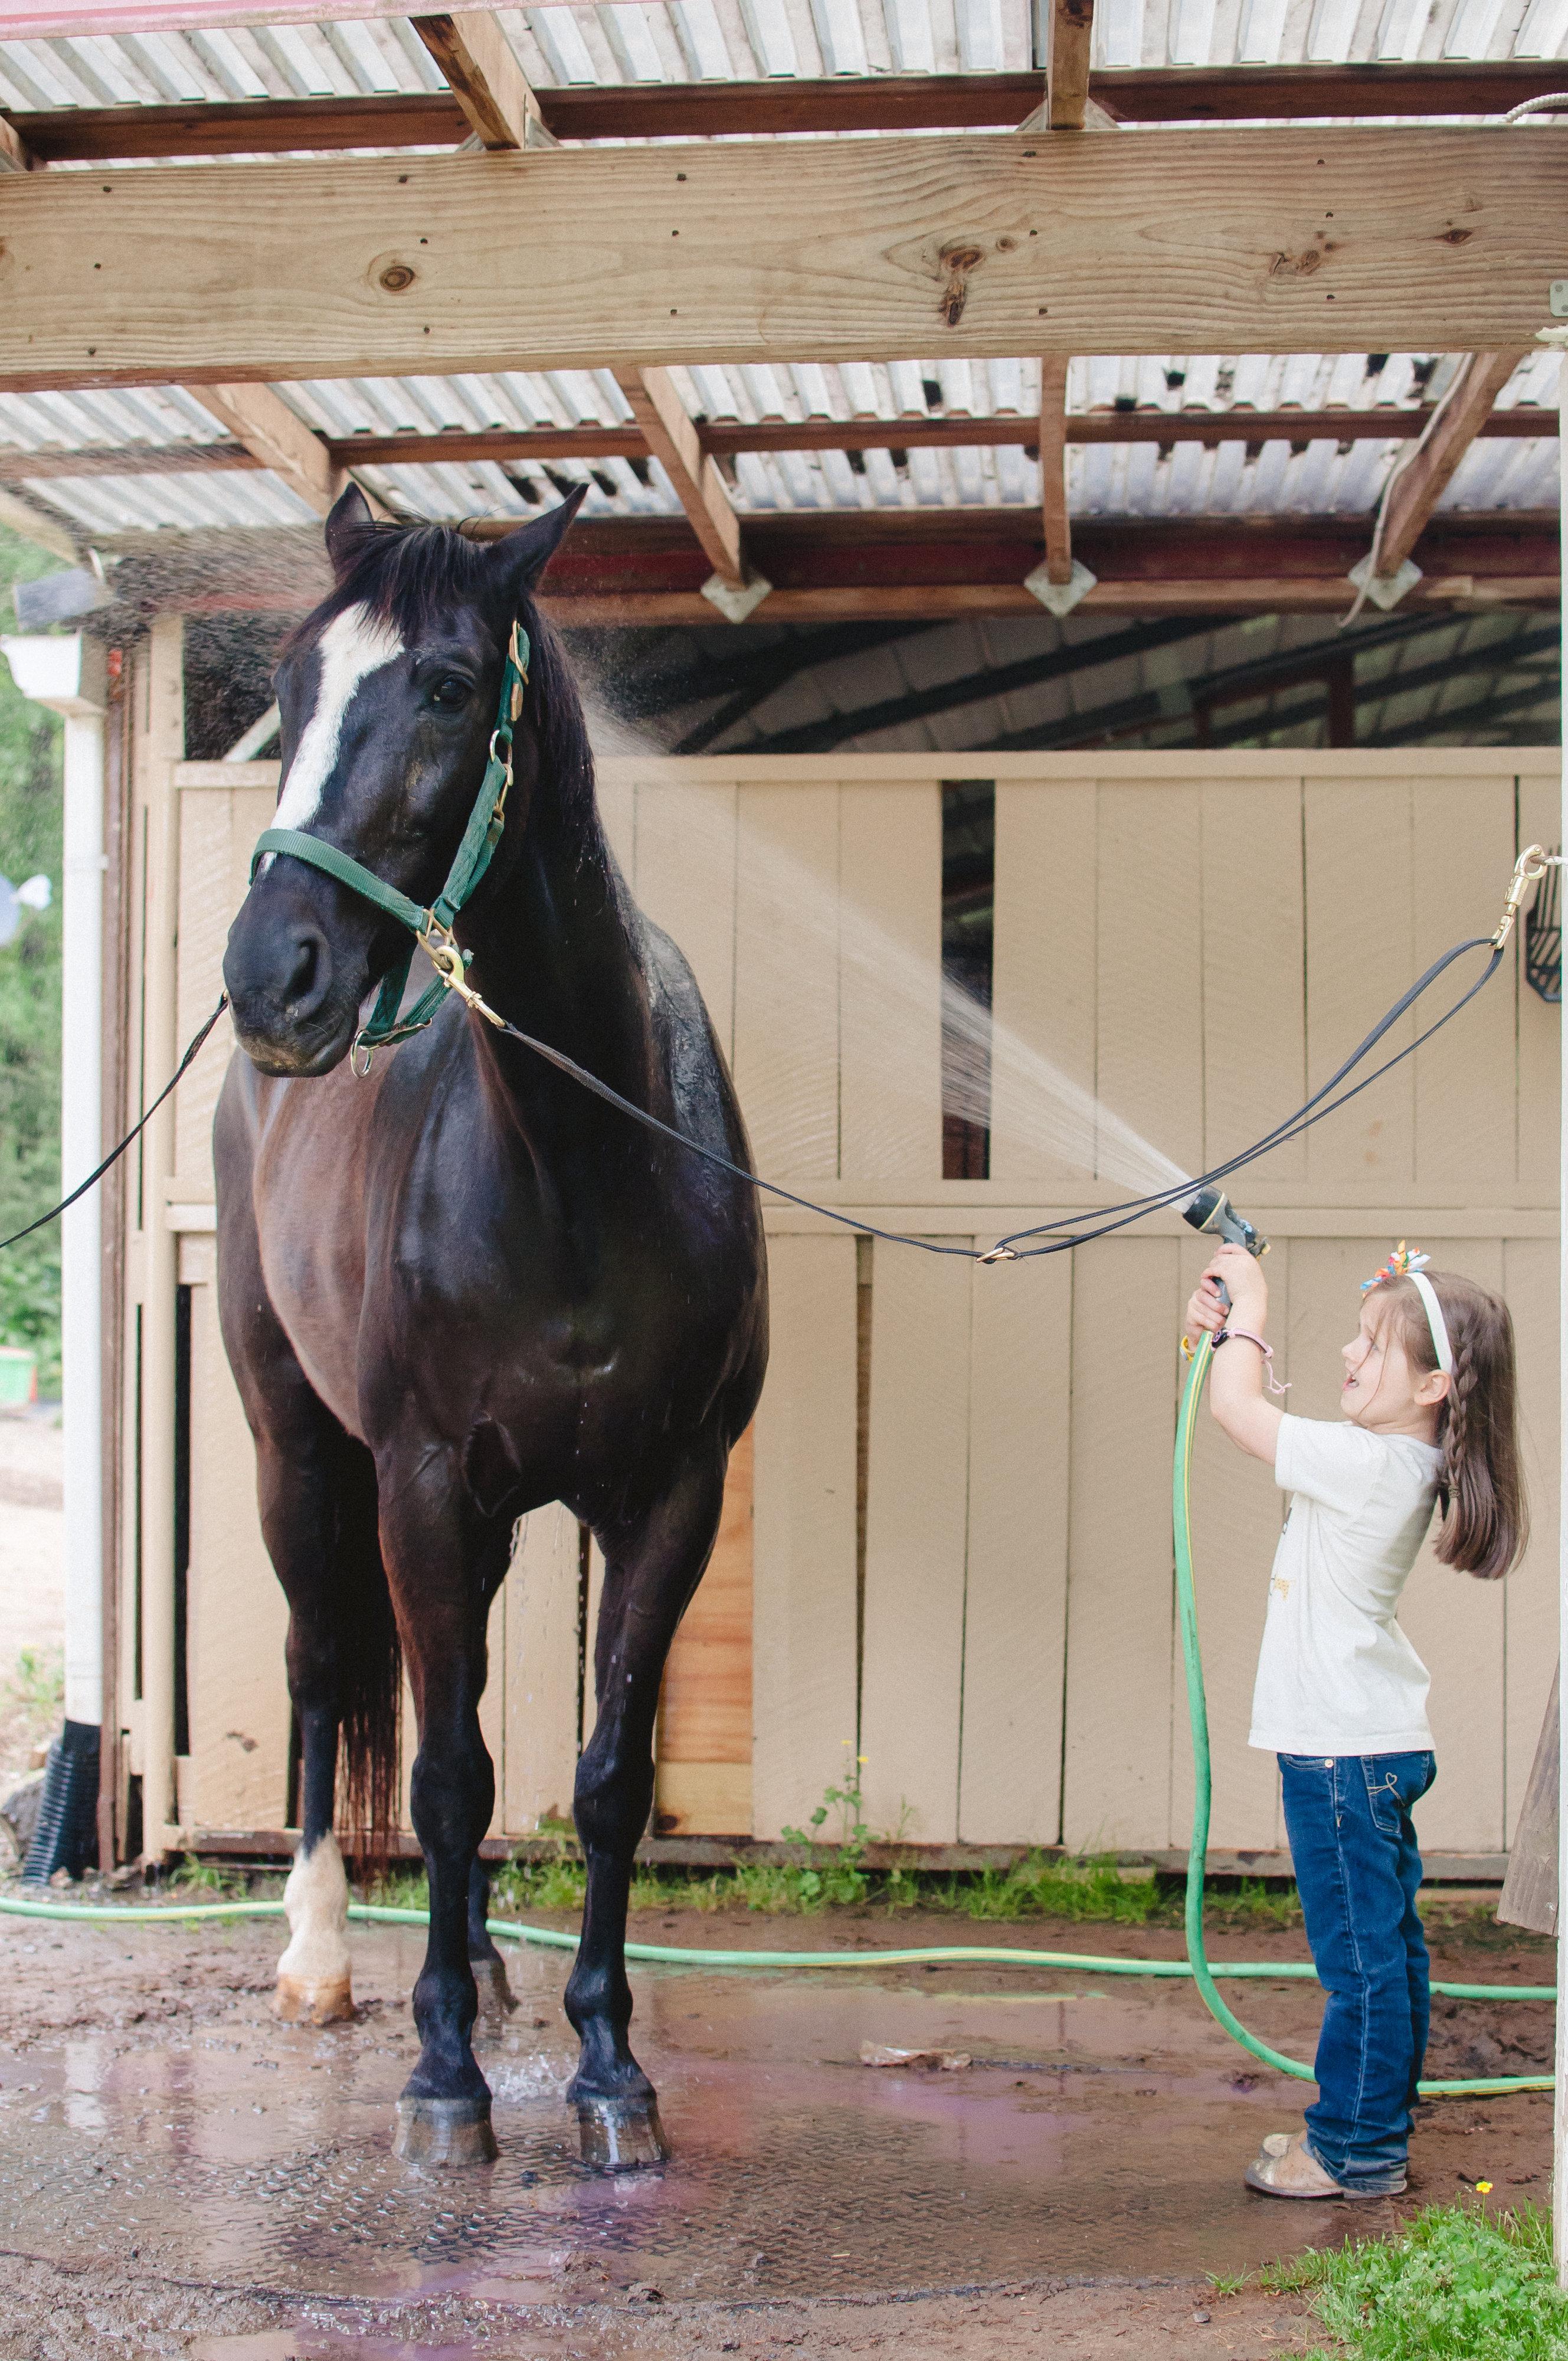 Little girl washing big horse